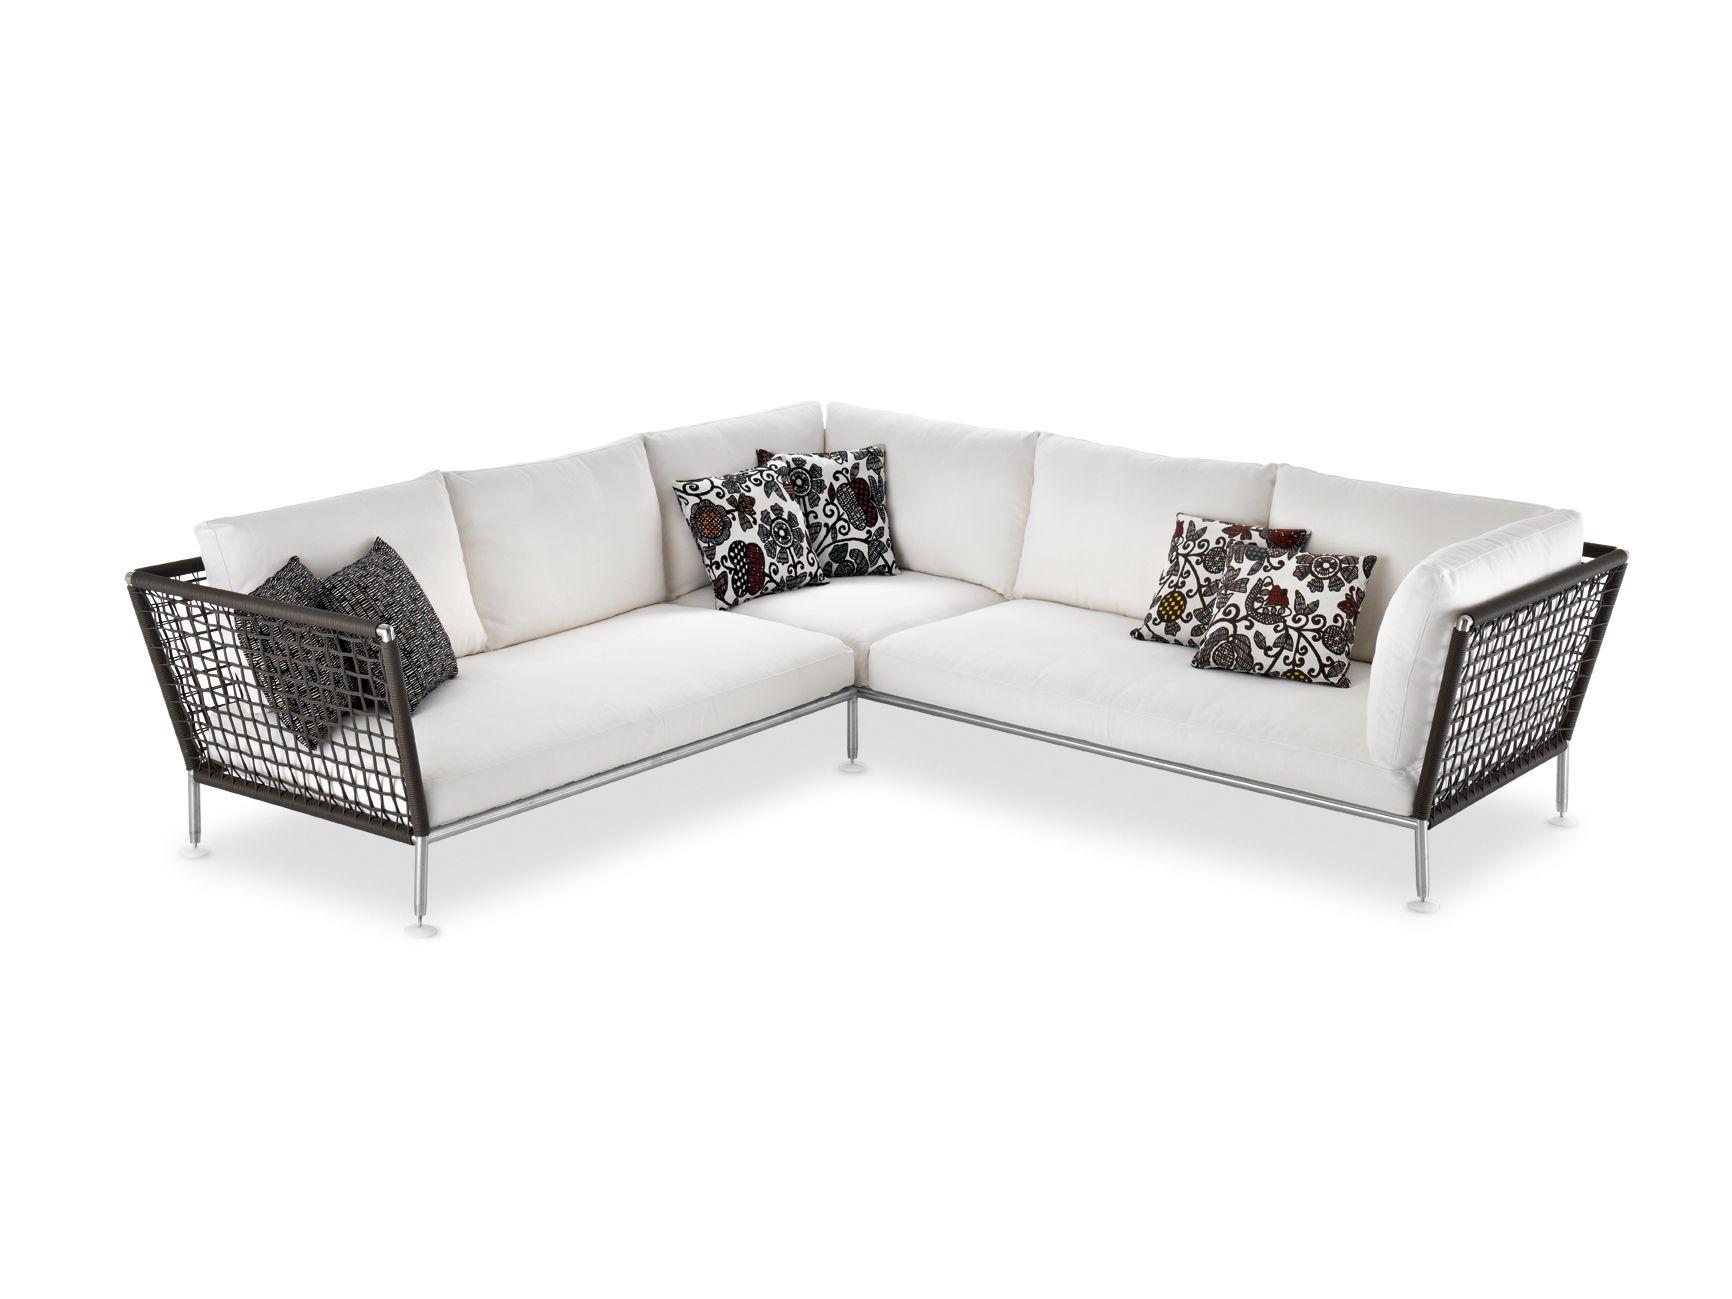 Coro Nest Designer Garden Sofa Luxury Garden Furniture Company Uk Corner Sofa Design Luxury Sofa Luxury Garden Furniture